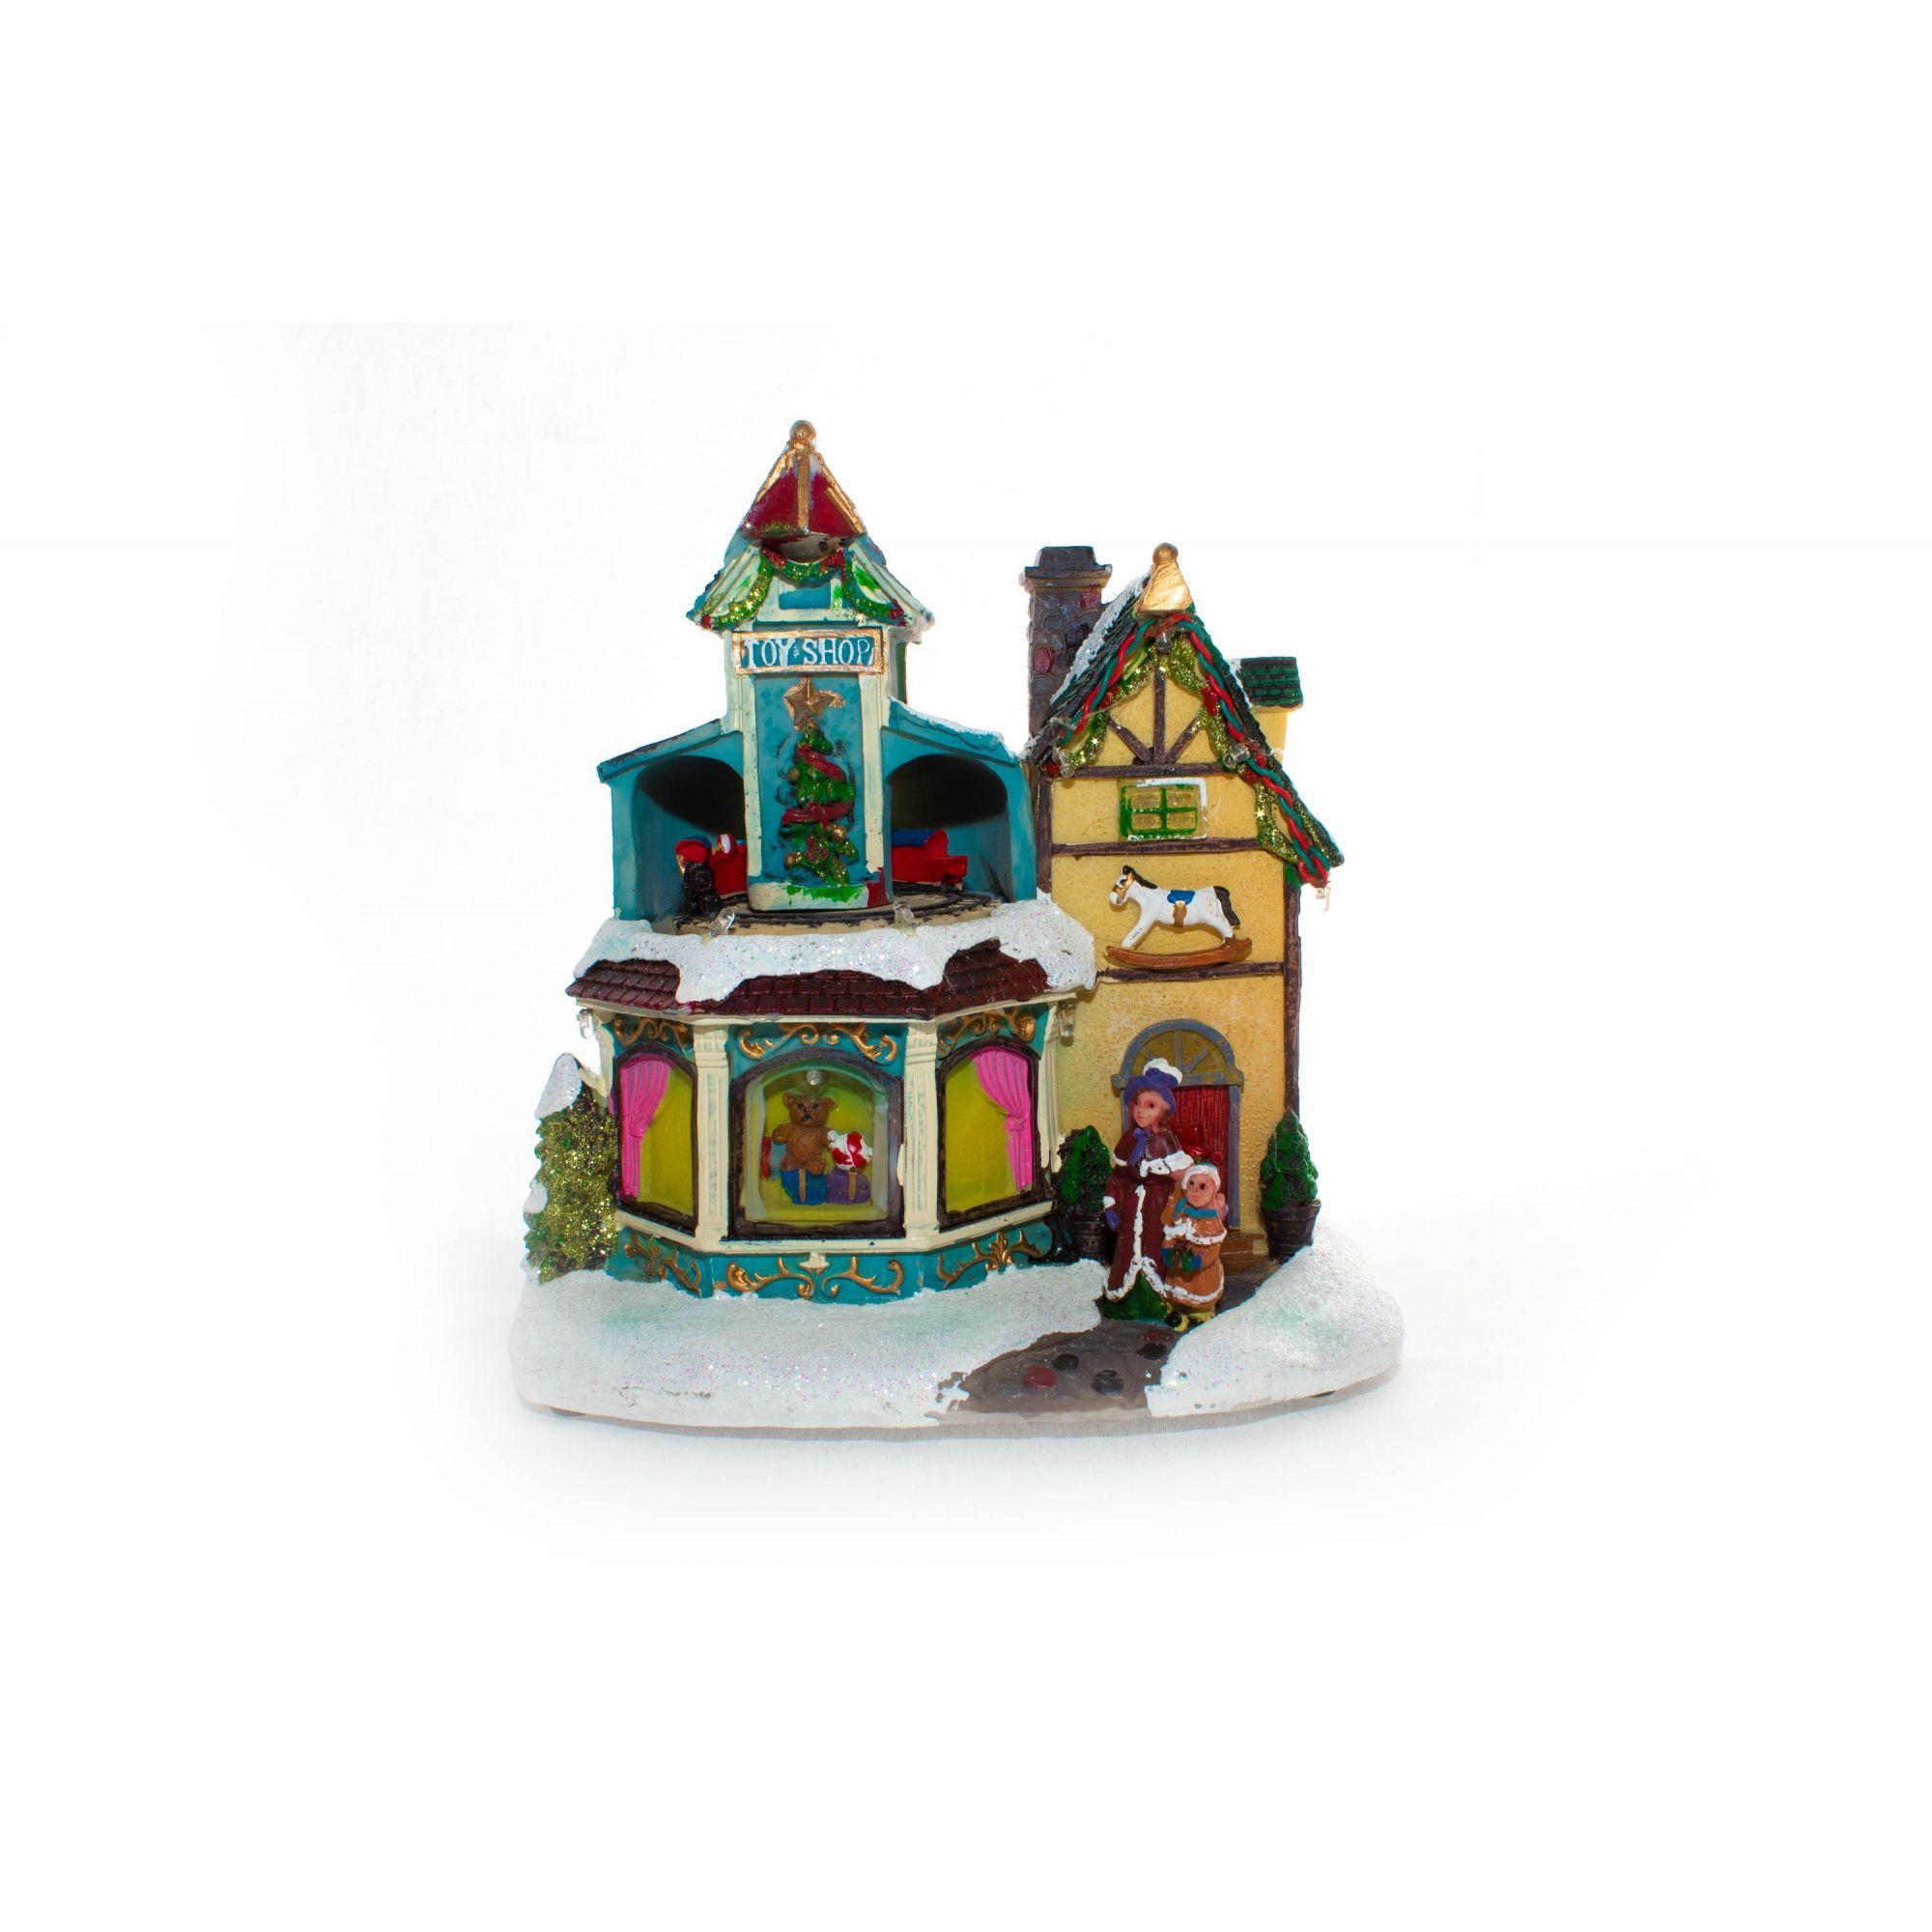 Vila Natalina Toy Shop